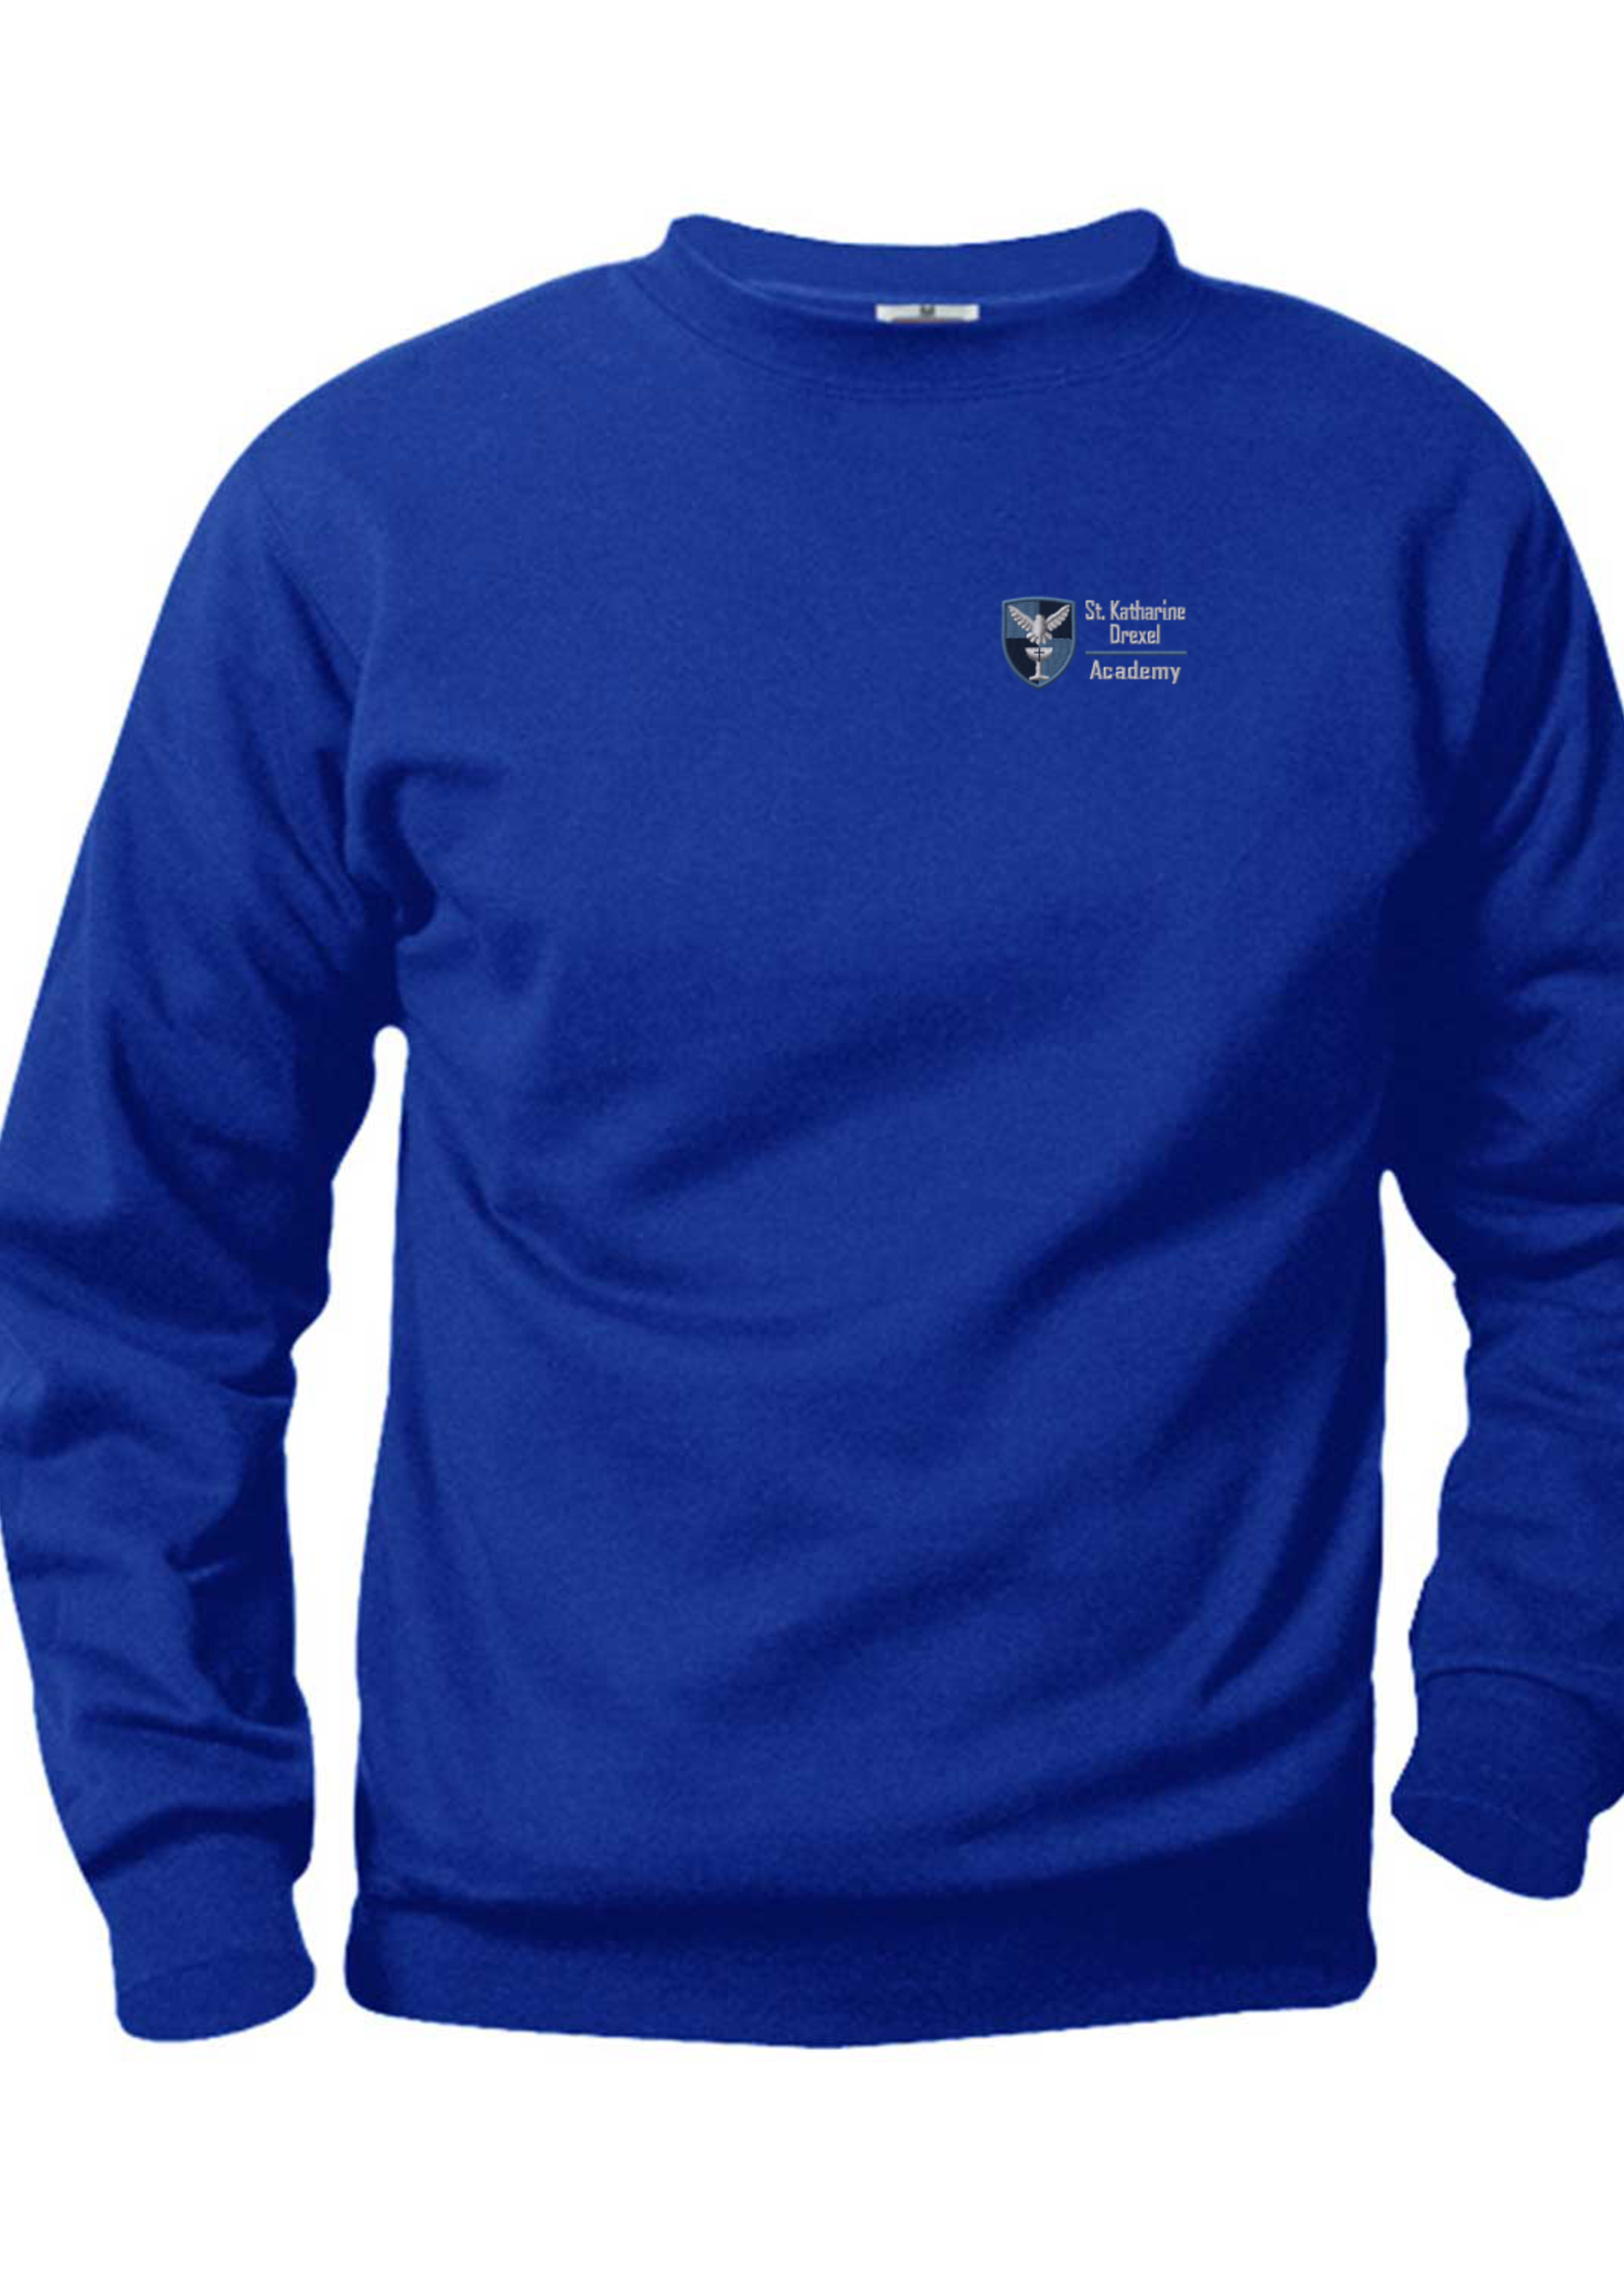 TUS SKDA Royal Fleece Crewneck Sweatshirt 5-8 (EMB)